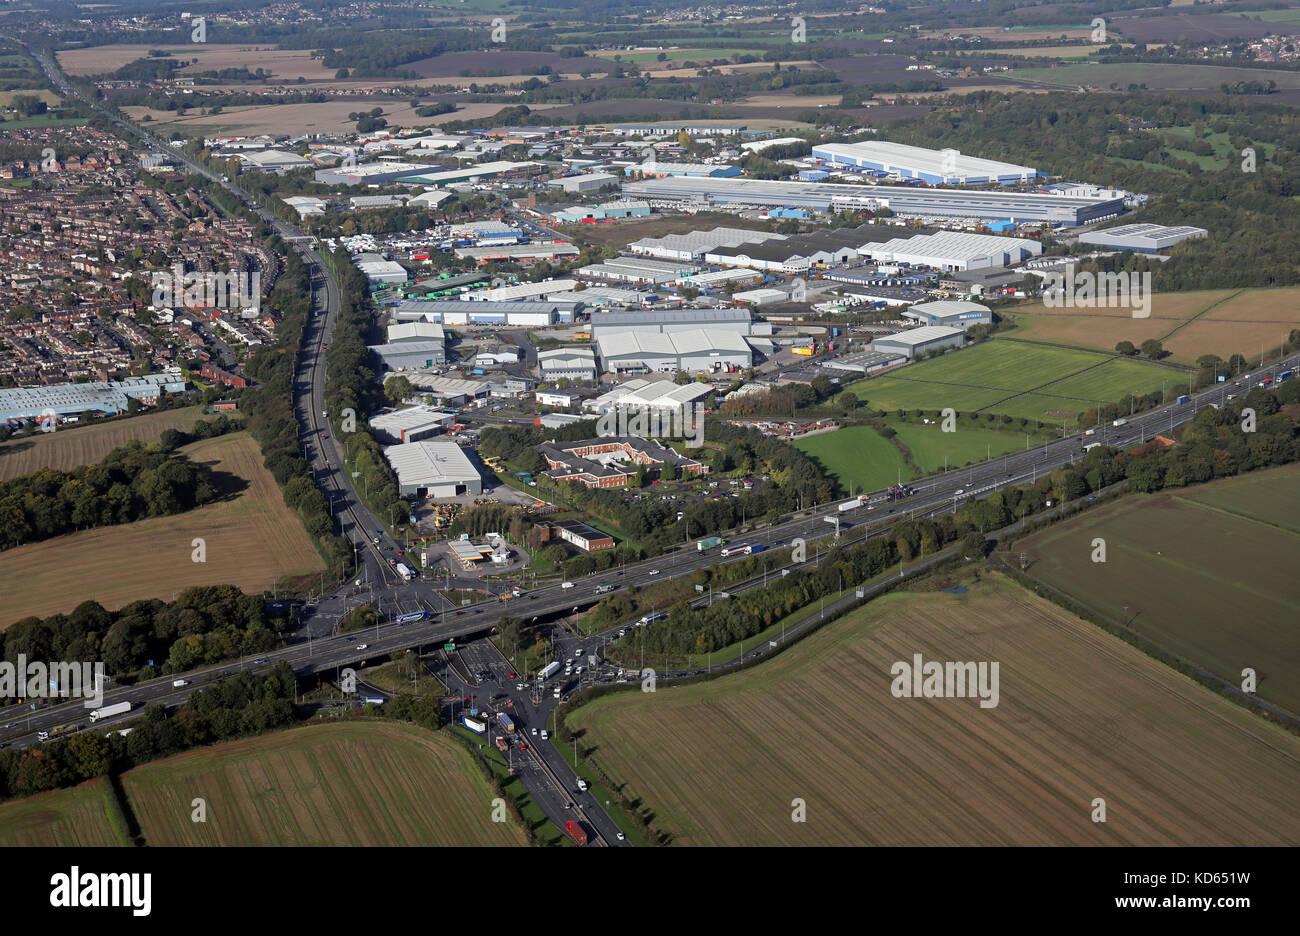 aerial view of Haydock Industrial Estate, UK - Stock Image